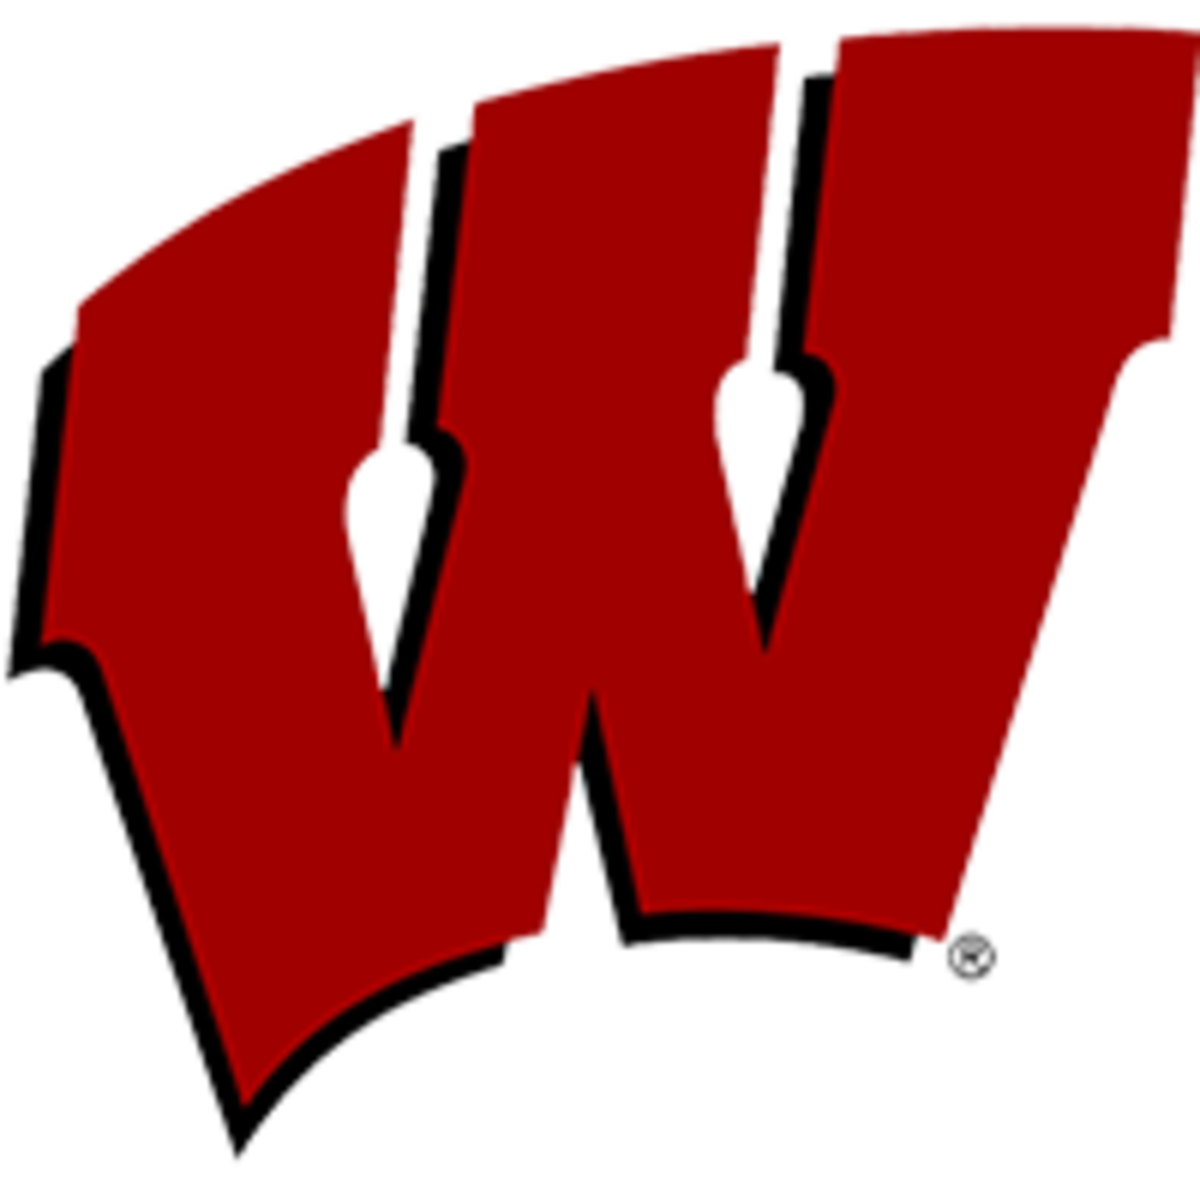 College Football Top 25 Rankings: Wisconsin